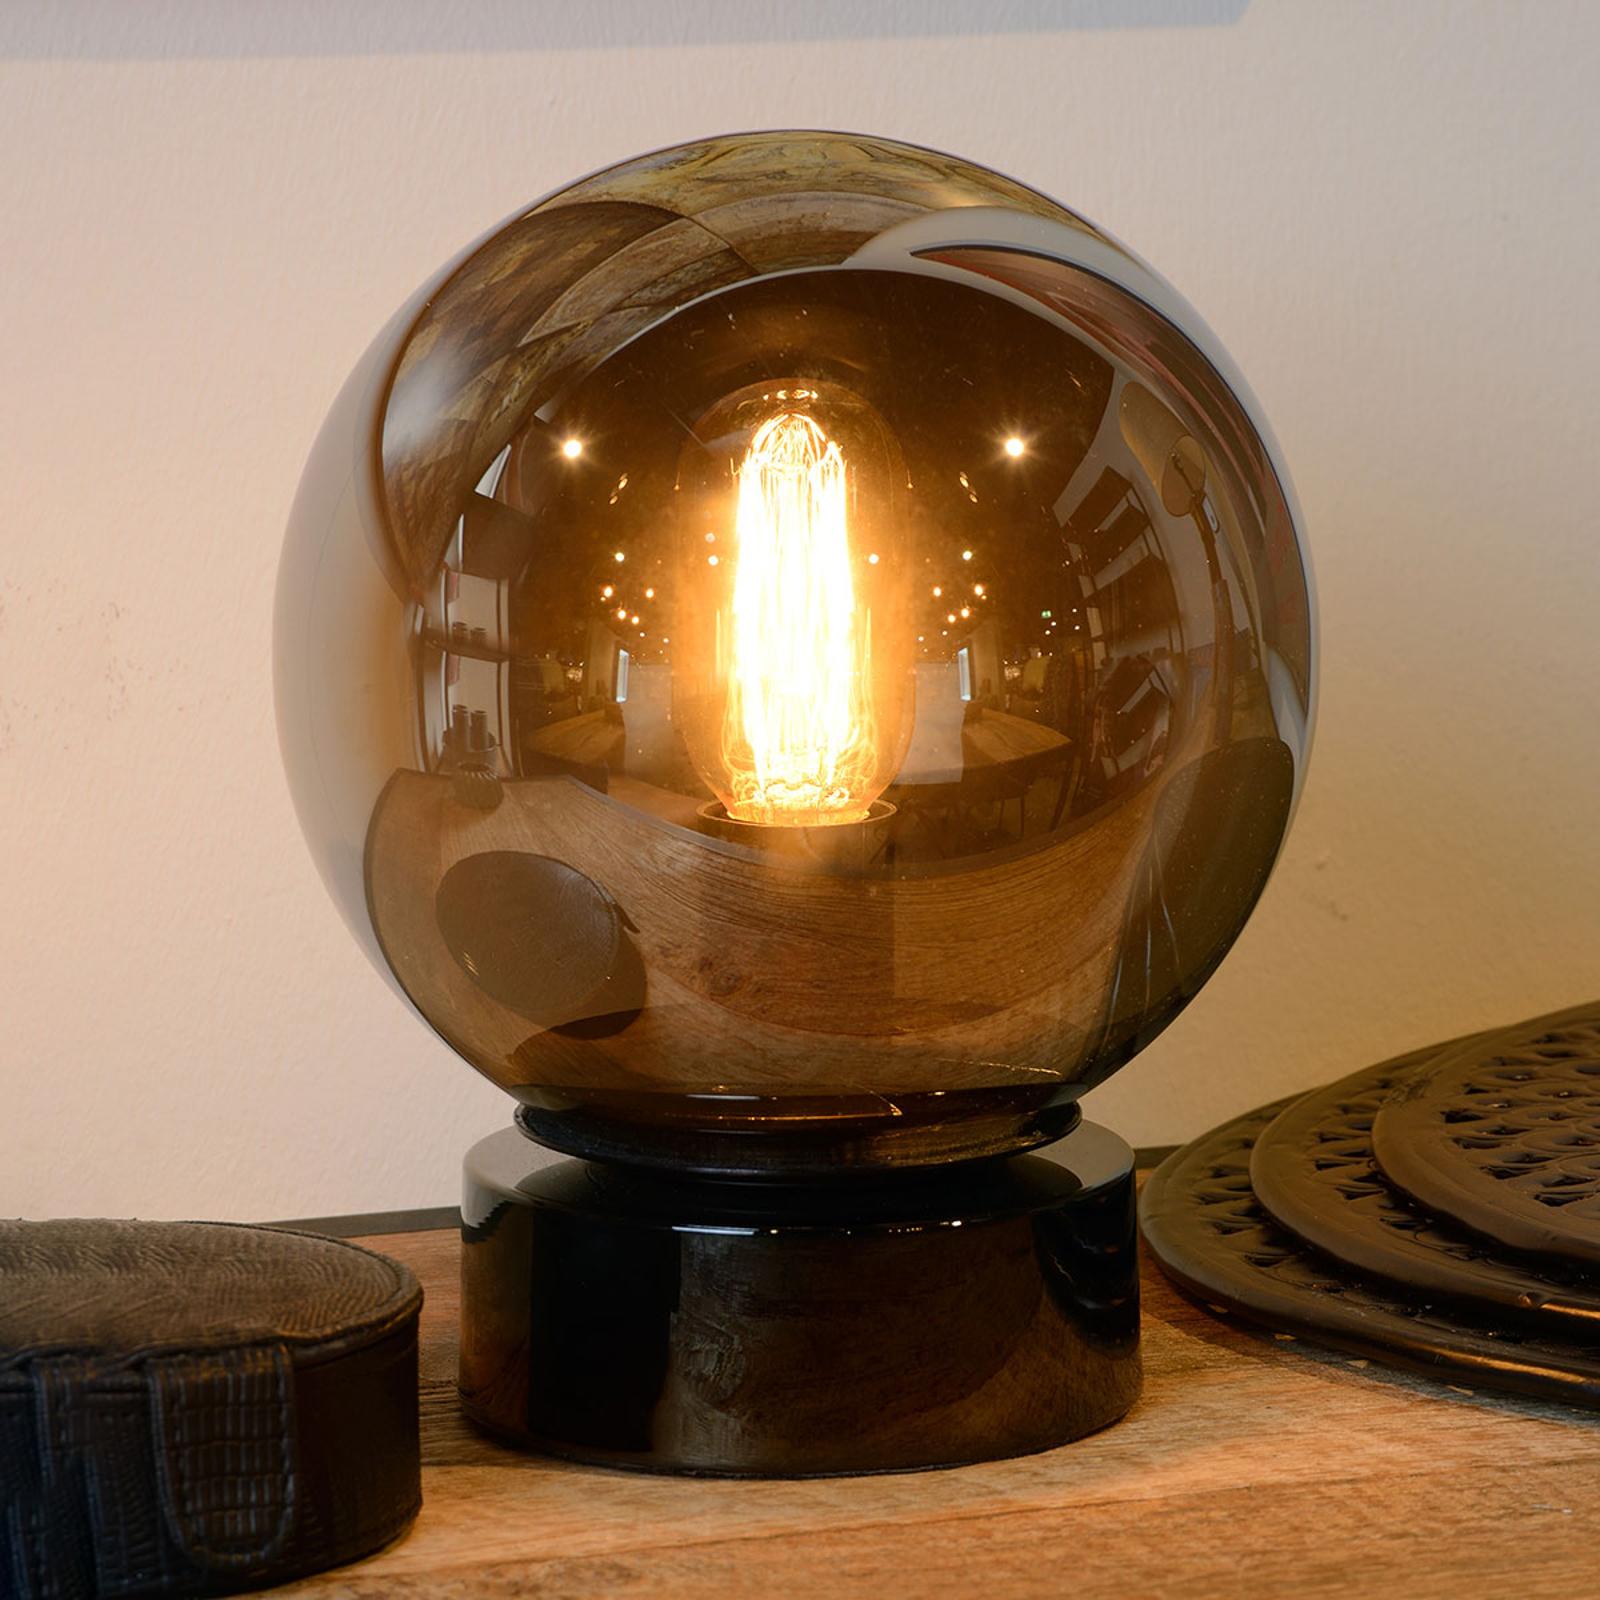 Jorit - glazen tafellamp met bolkap 20cm